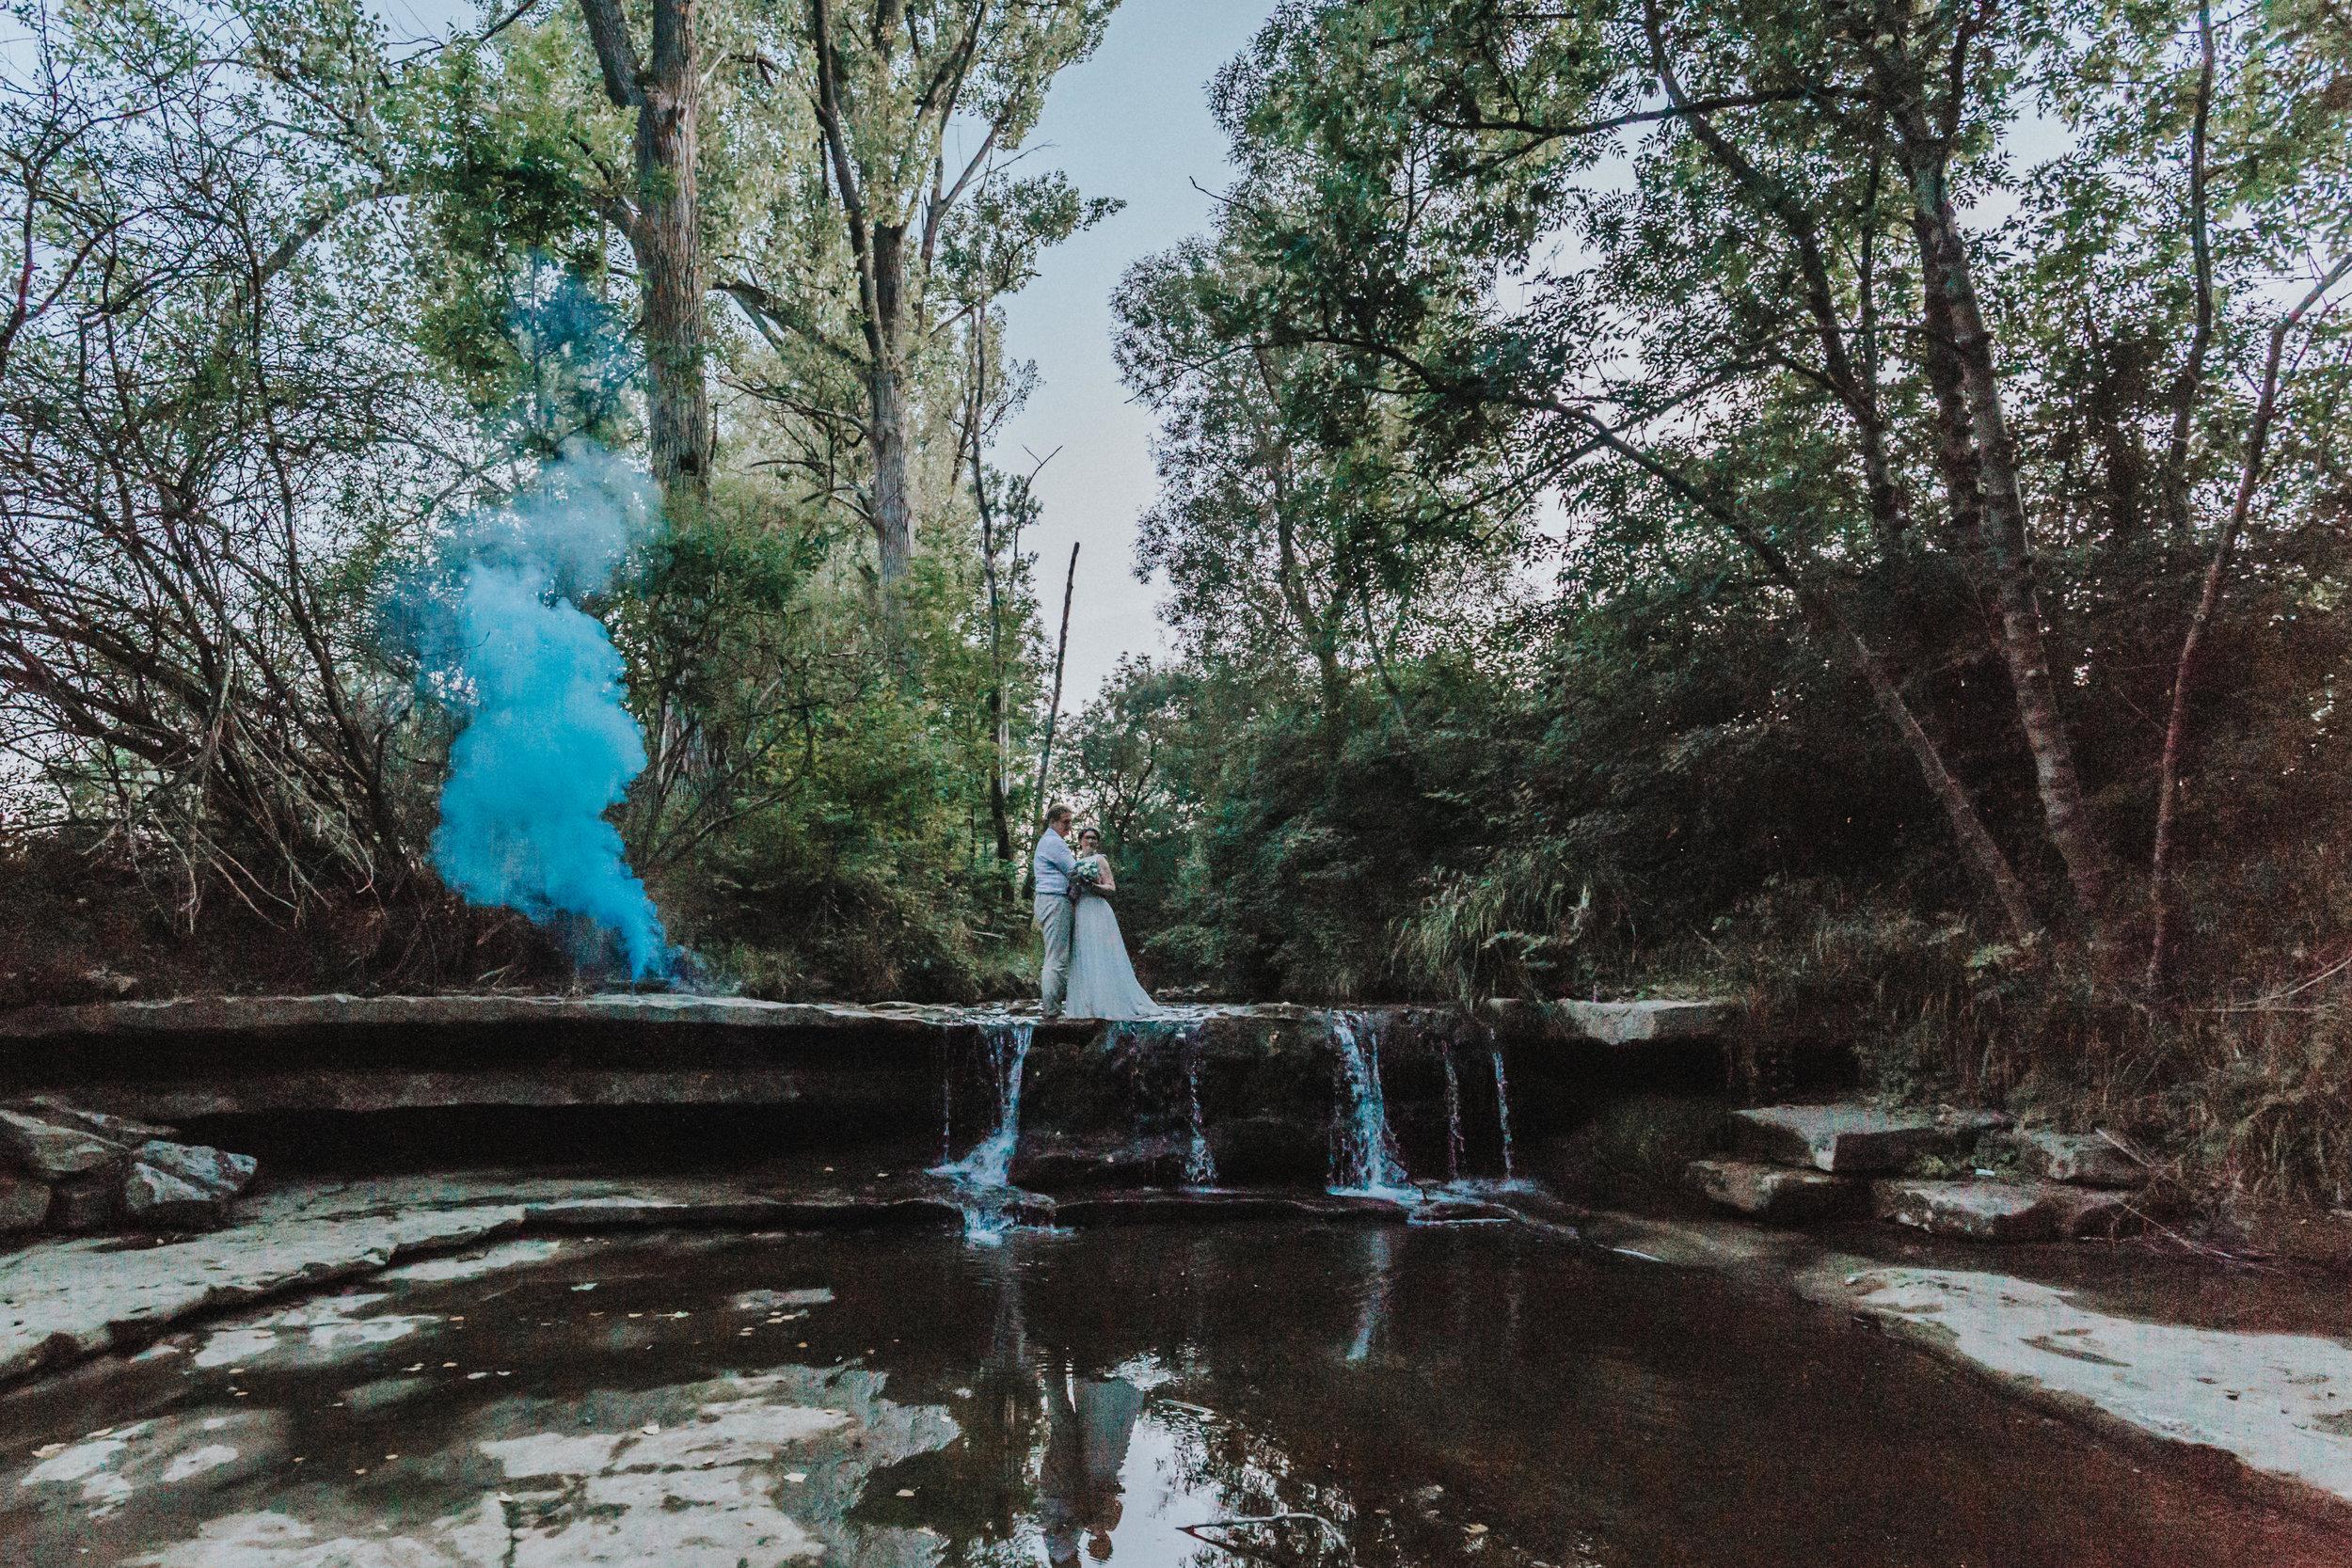 yessica-baur-fotografie-after-wedding-tübingen-001-1530.JPG